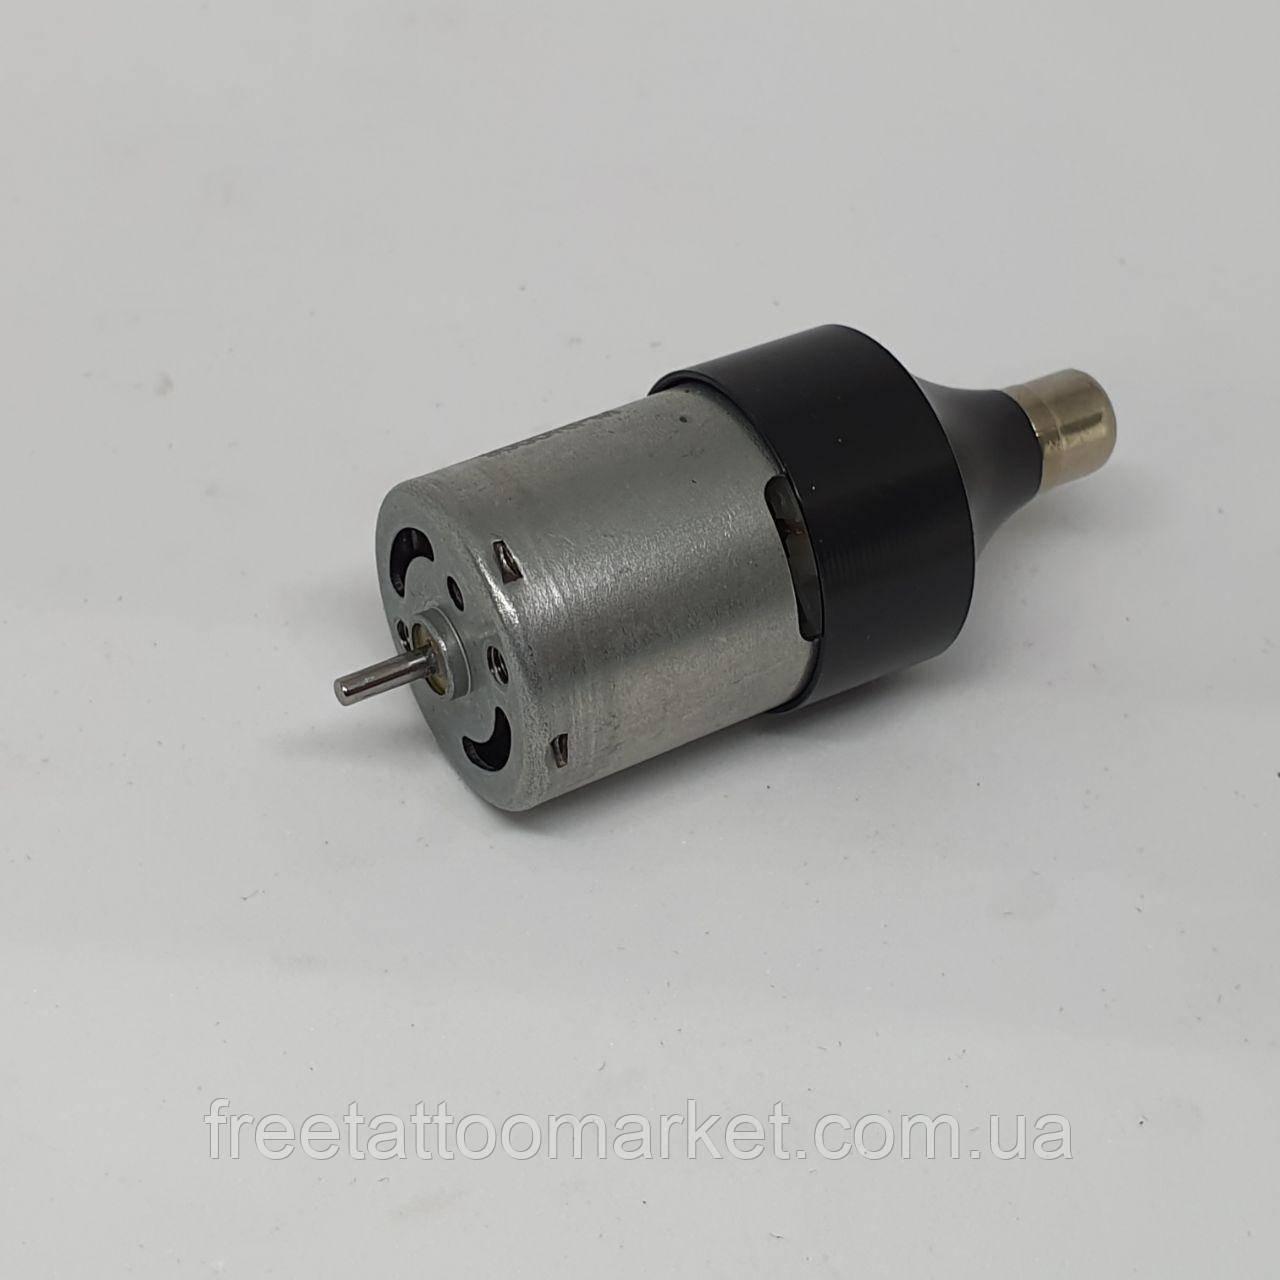 Мотор для тату машинки-ручки c RCA